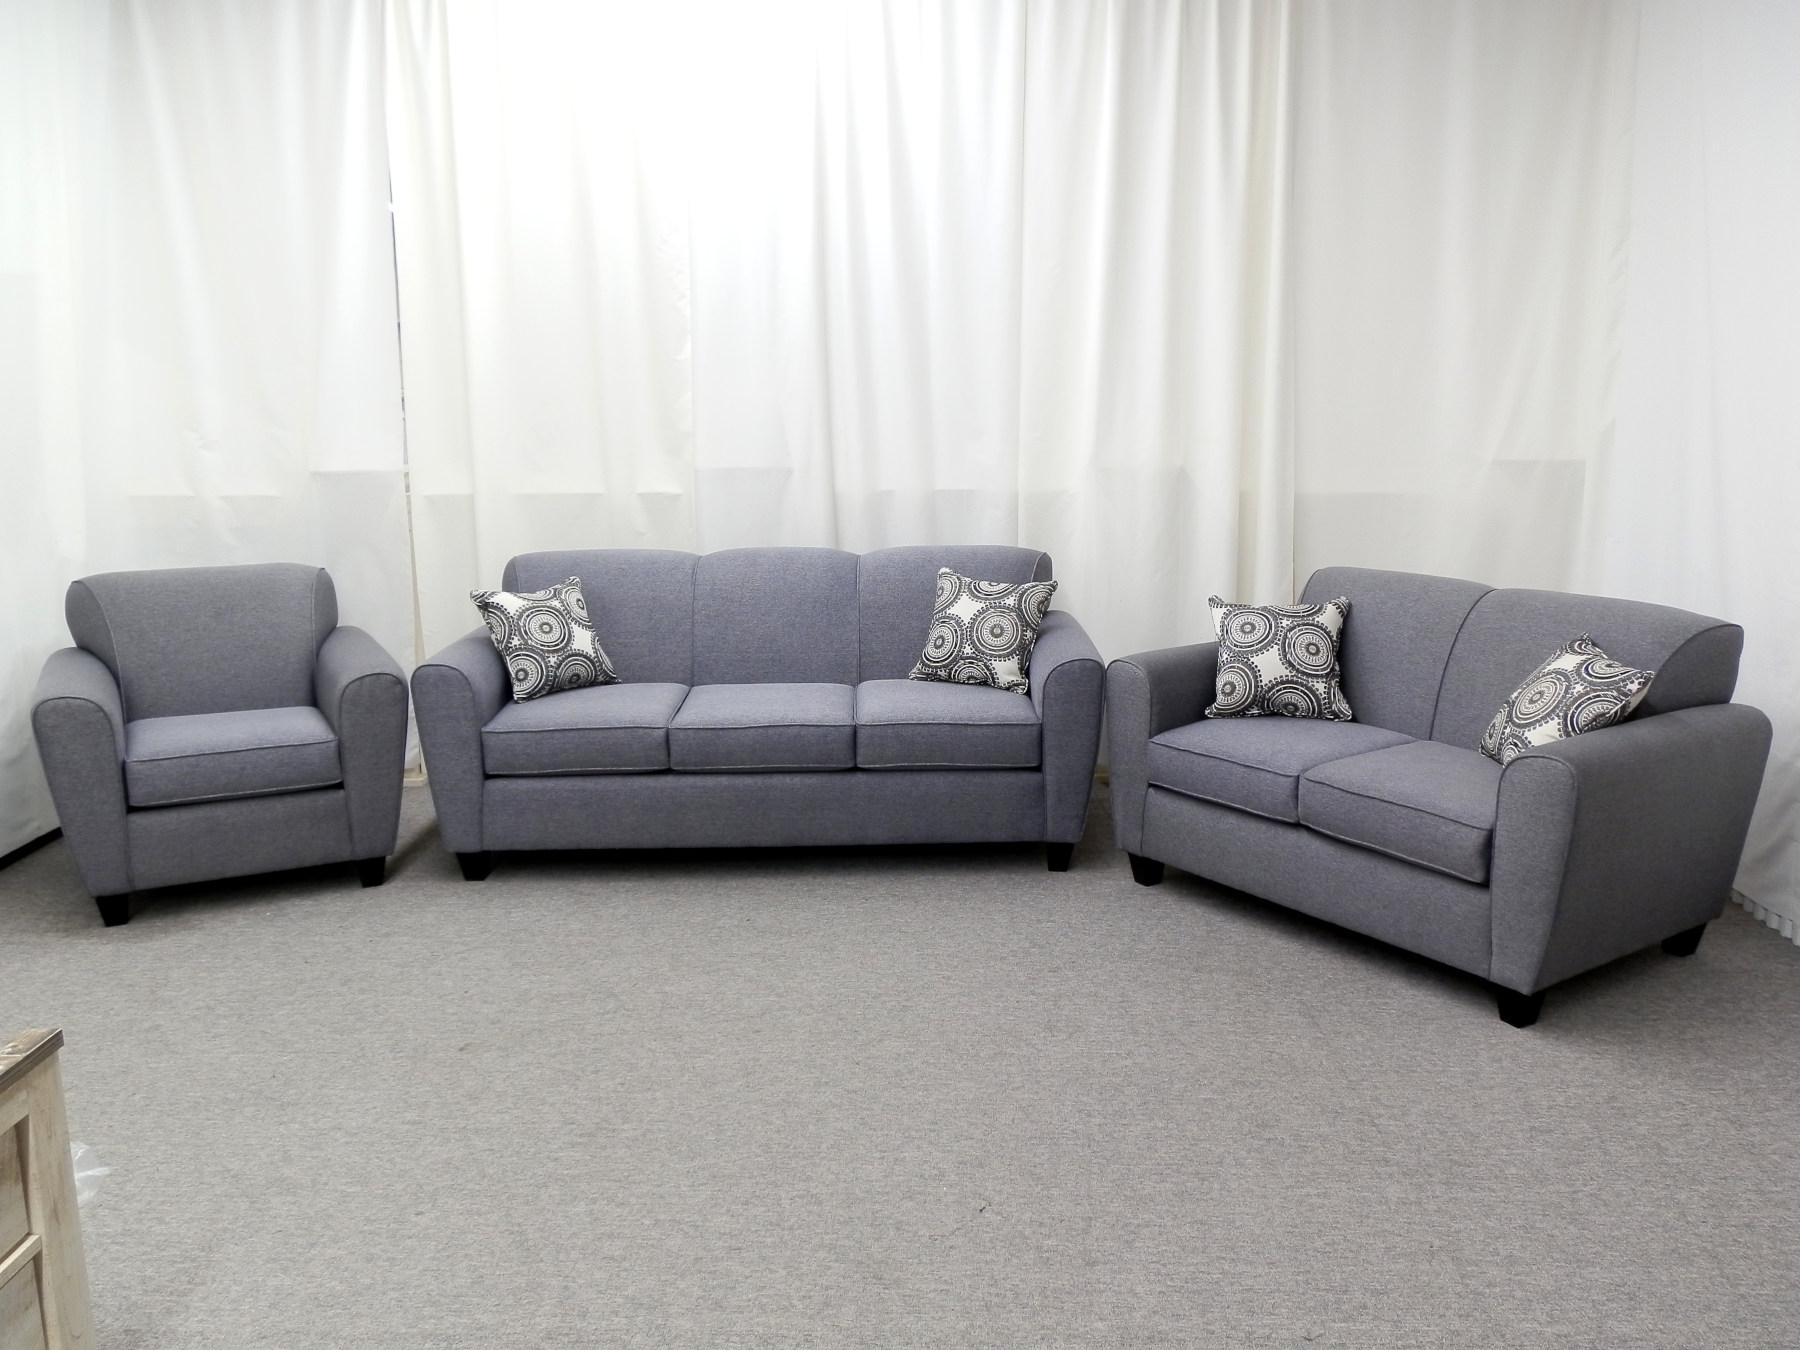 23358 – Sofa Set – AU-2860-H99